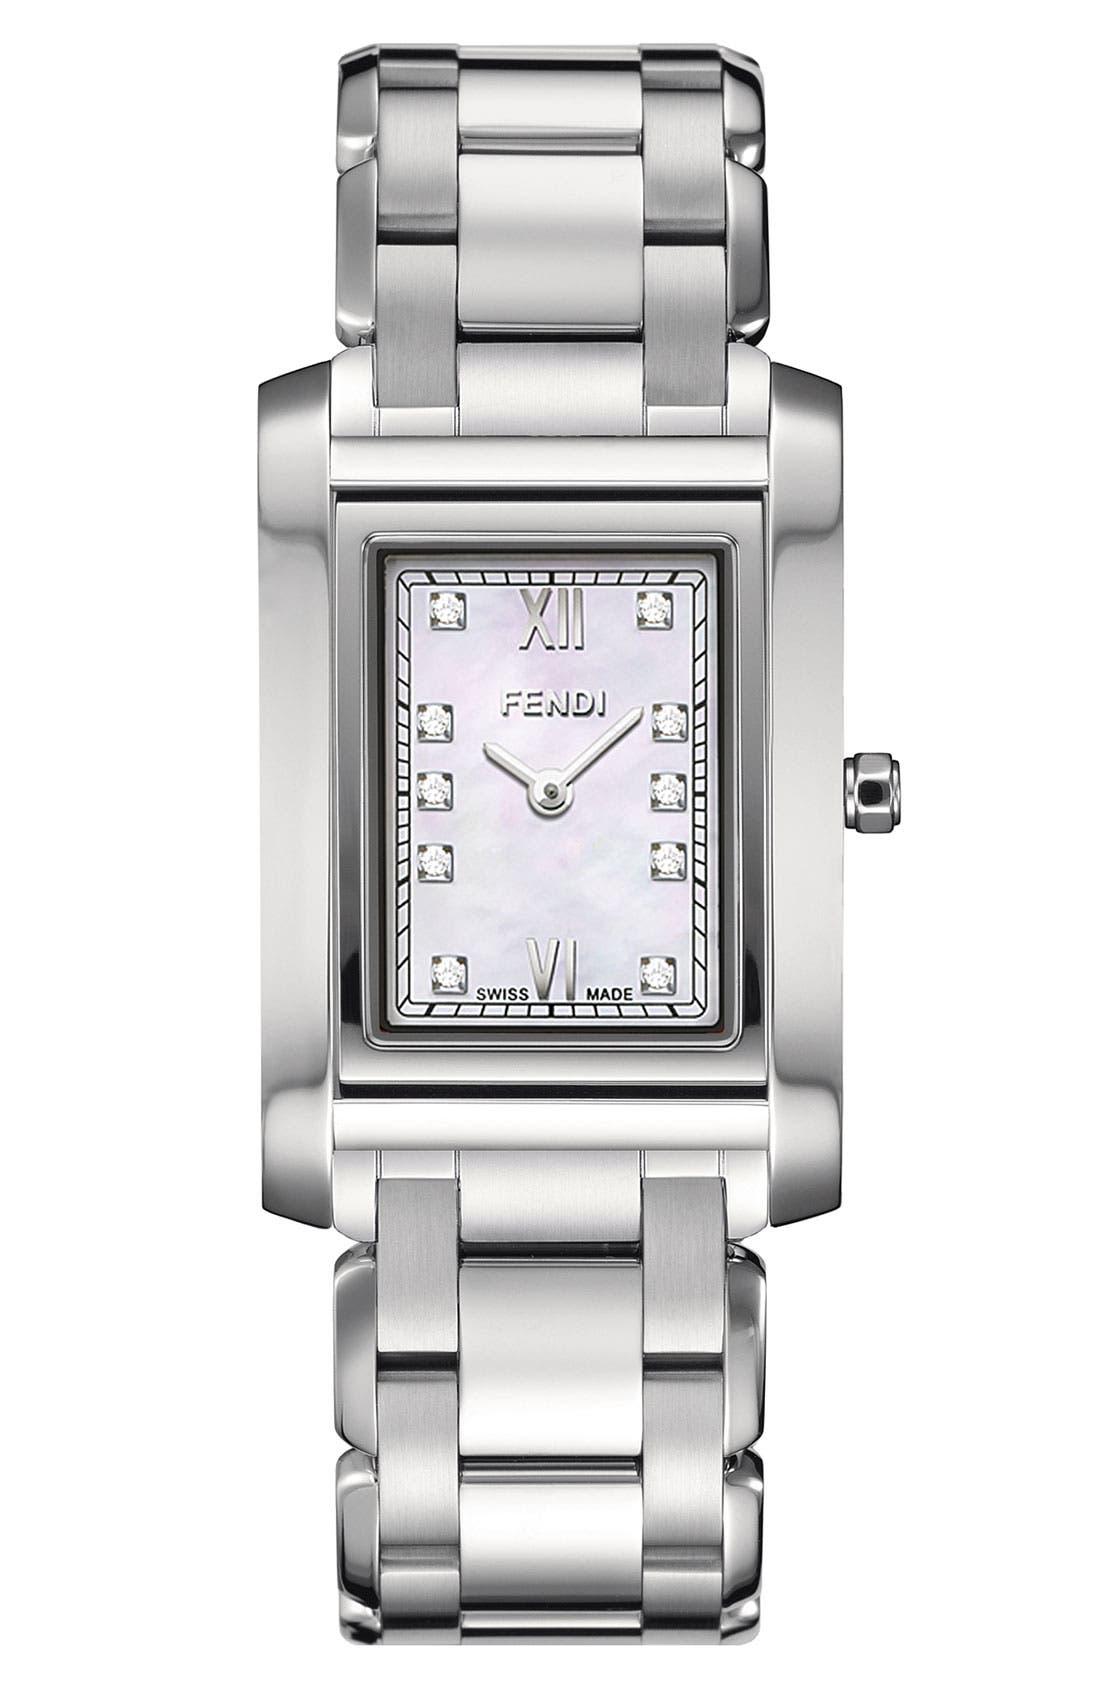 Alternate Image 1 Selected - Fendi 'Loop - Small' Diamond Dial Watch, 21mm x 34mm